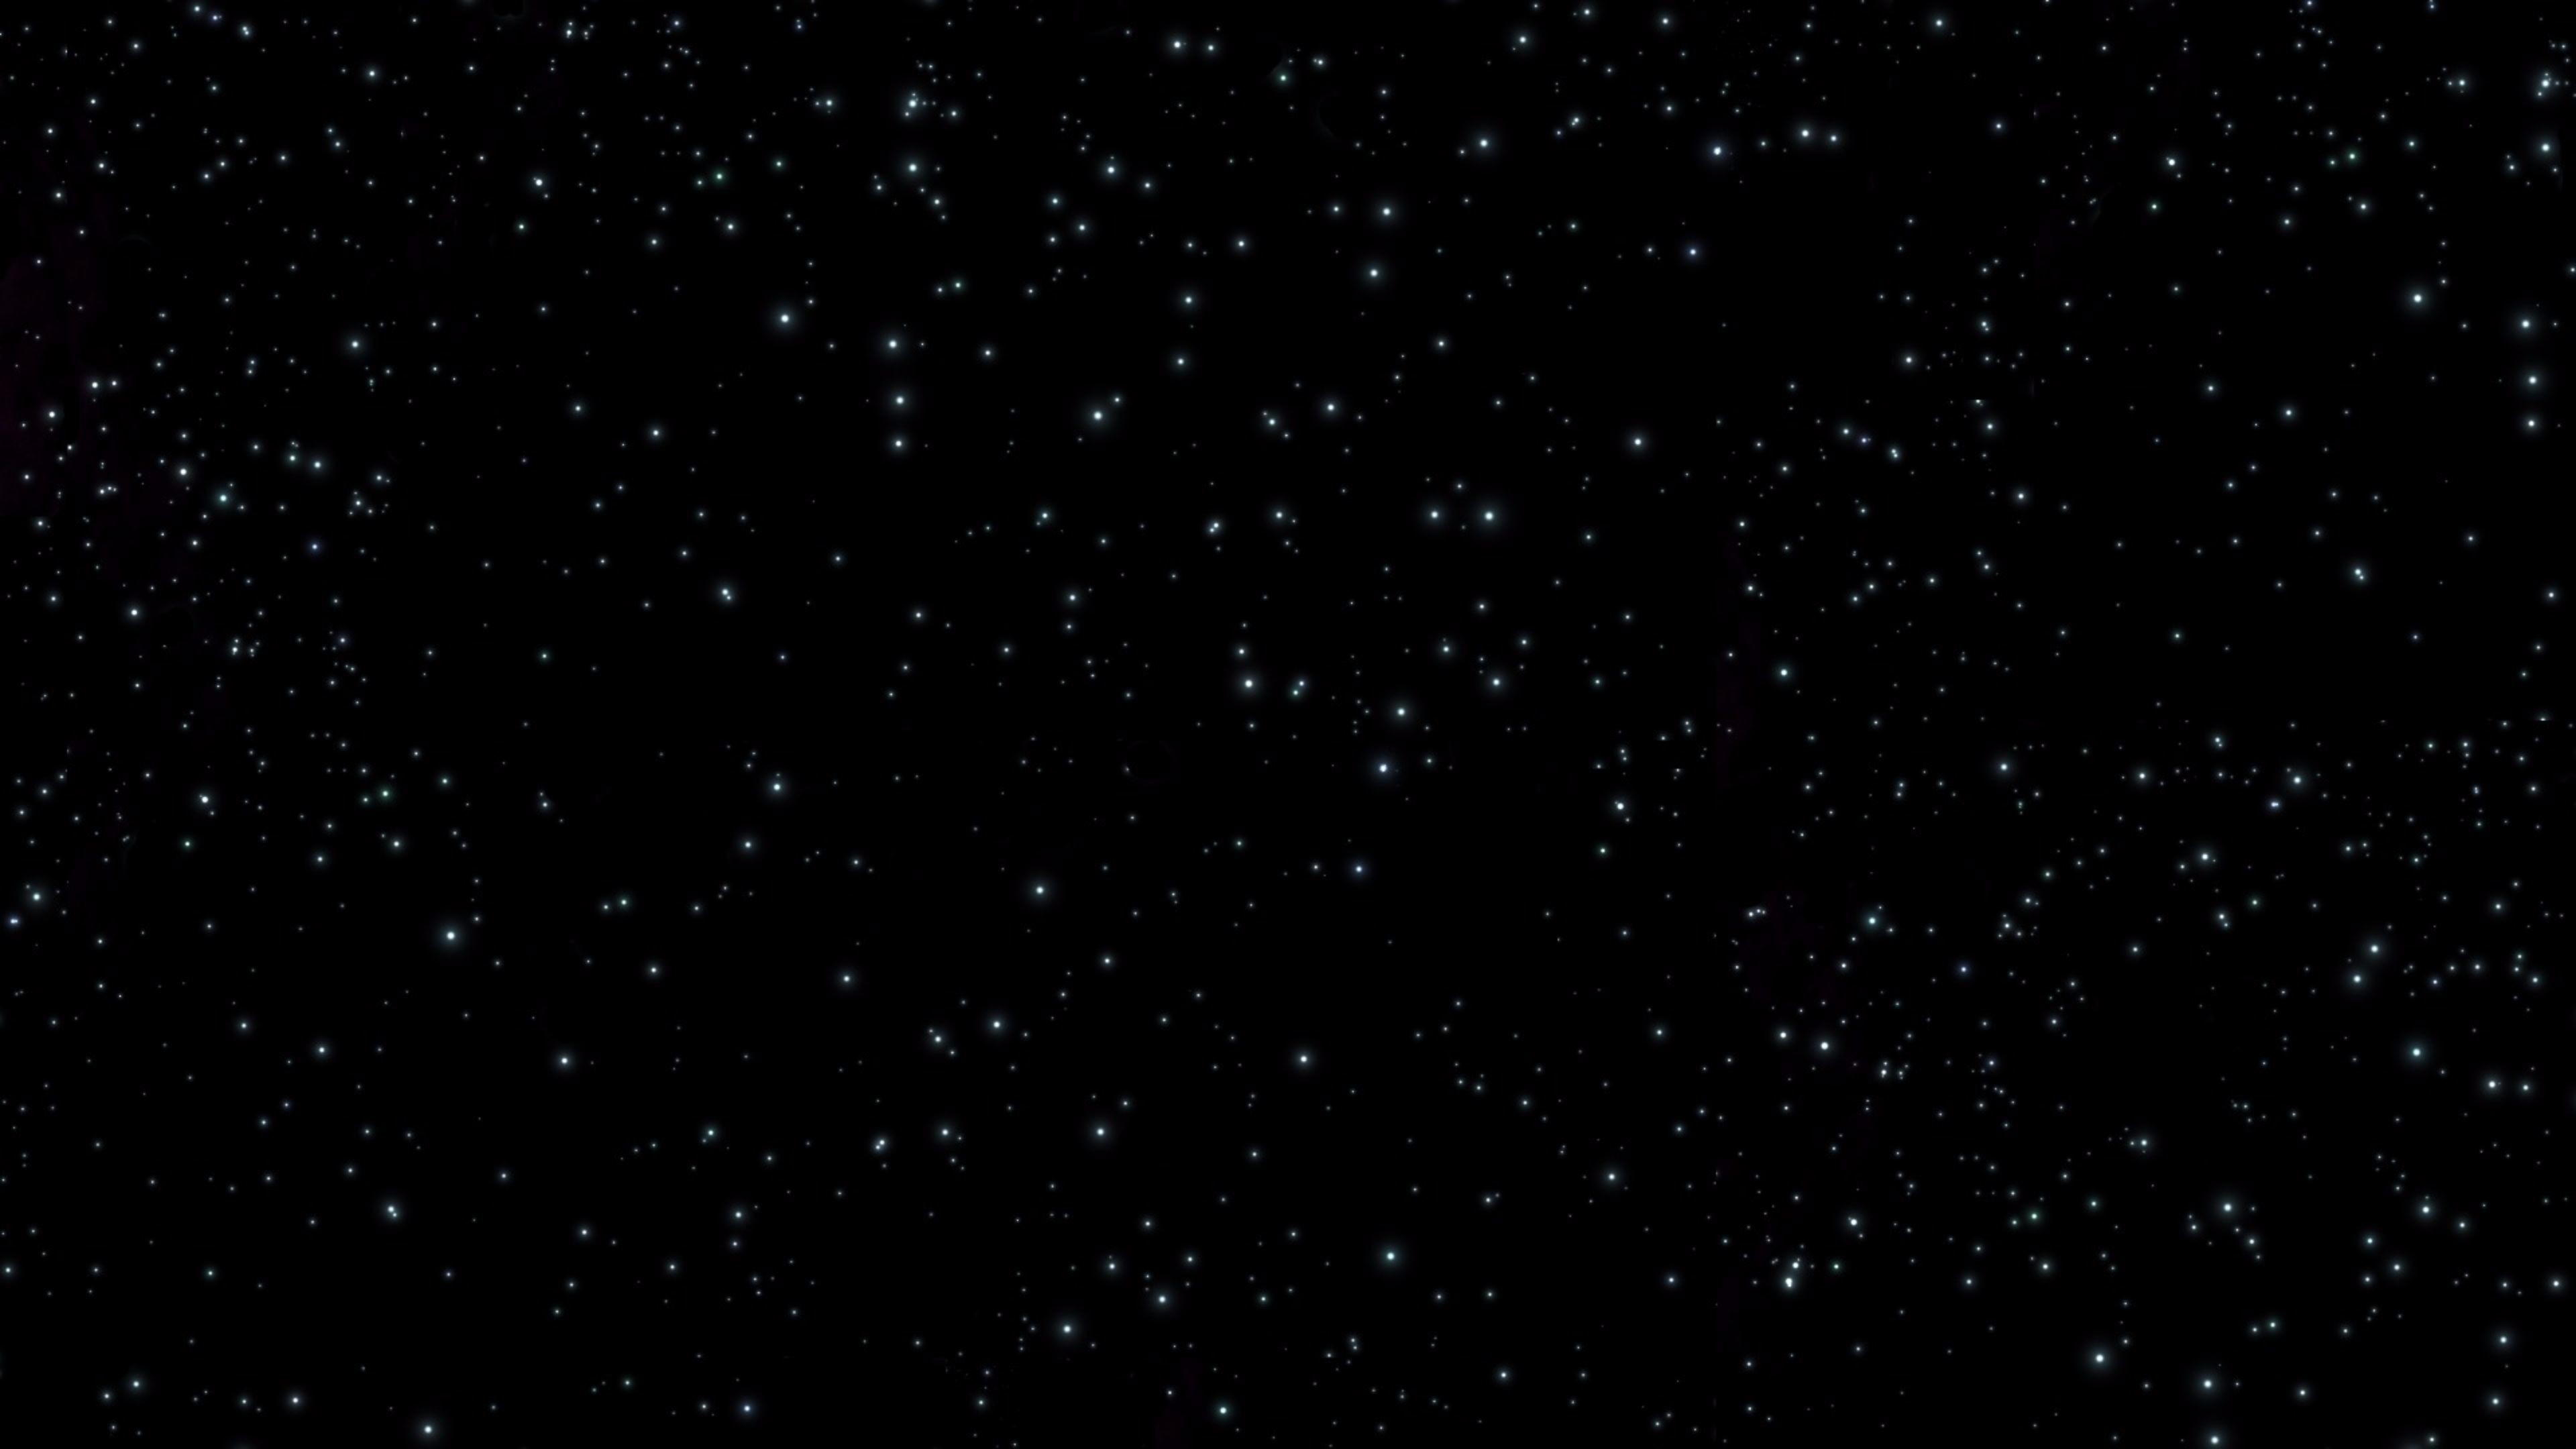 Whte Lights in Space 4K Wallpaper